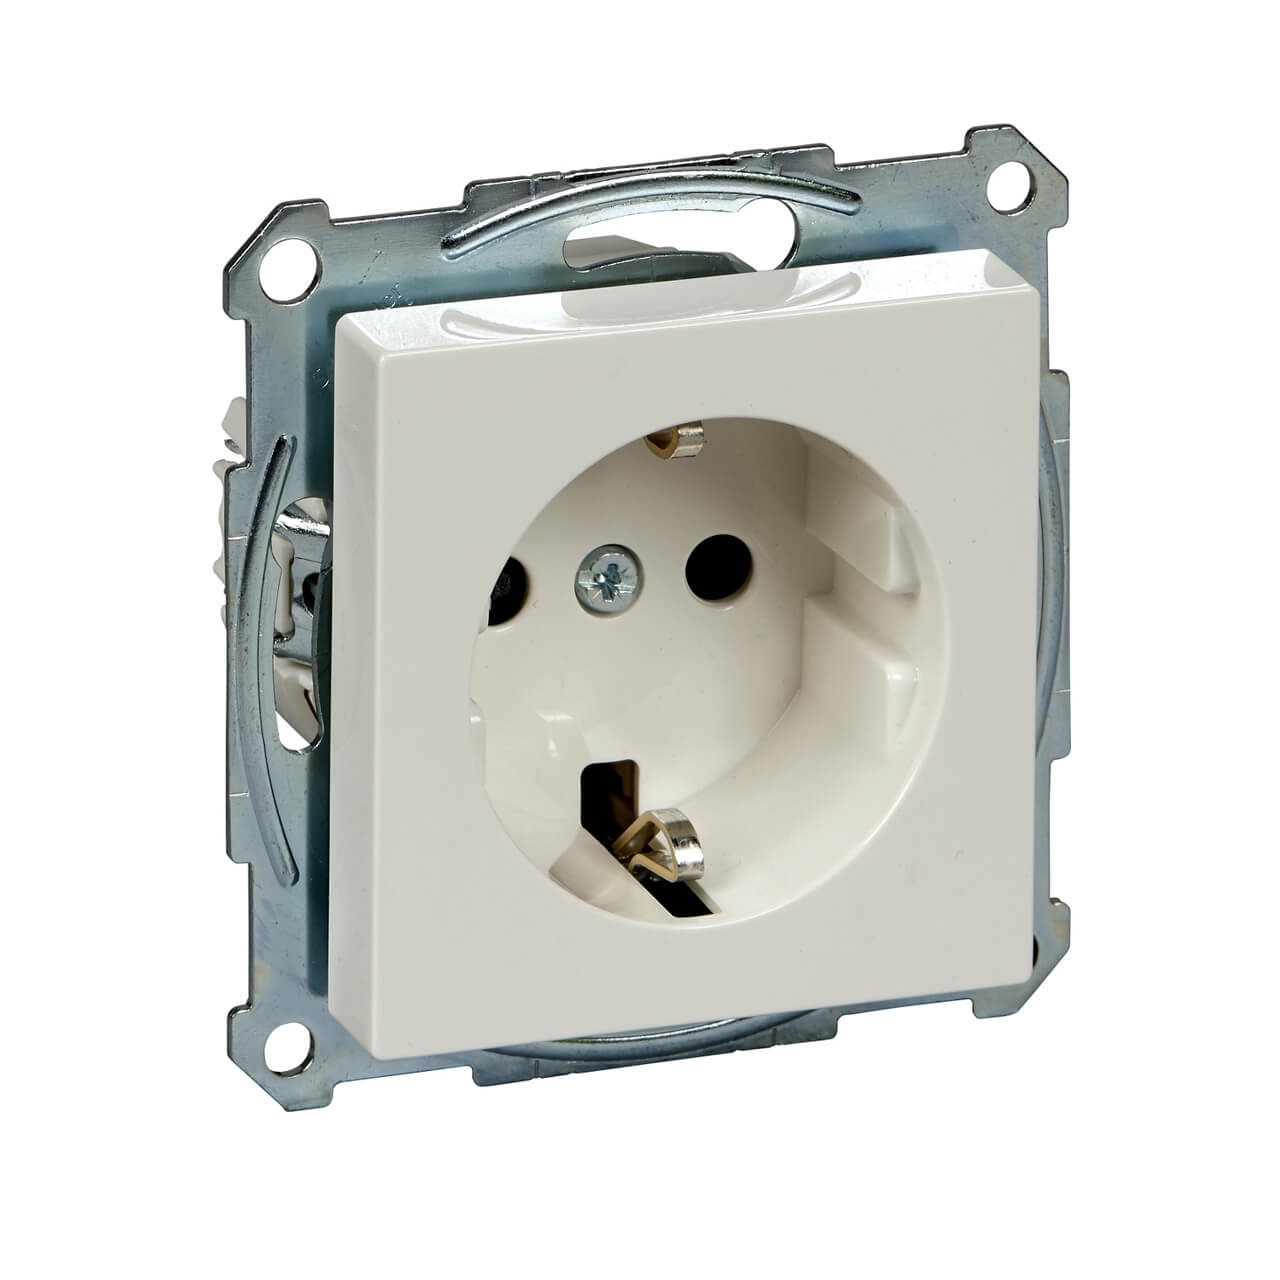 Фото - Розетка Schneider Electric MTN2300-0319 Merten System M розетка schneider electric merten system m с з и шторками mtn2300 0319